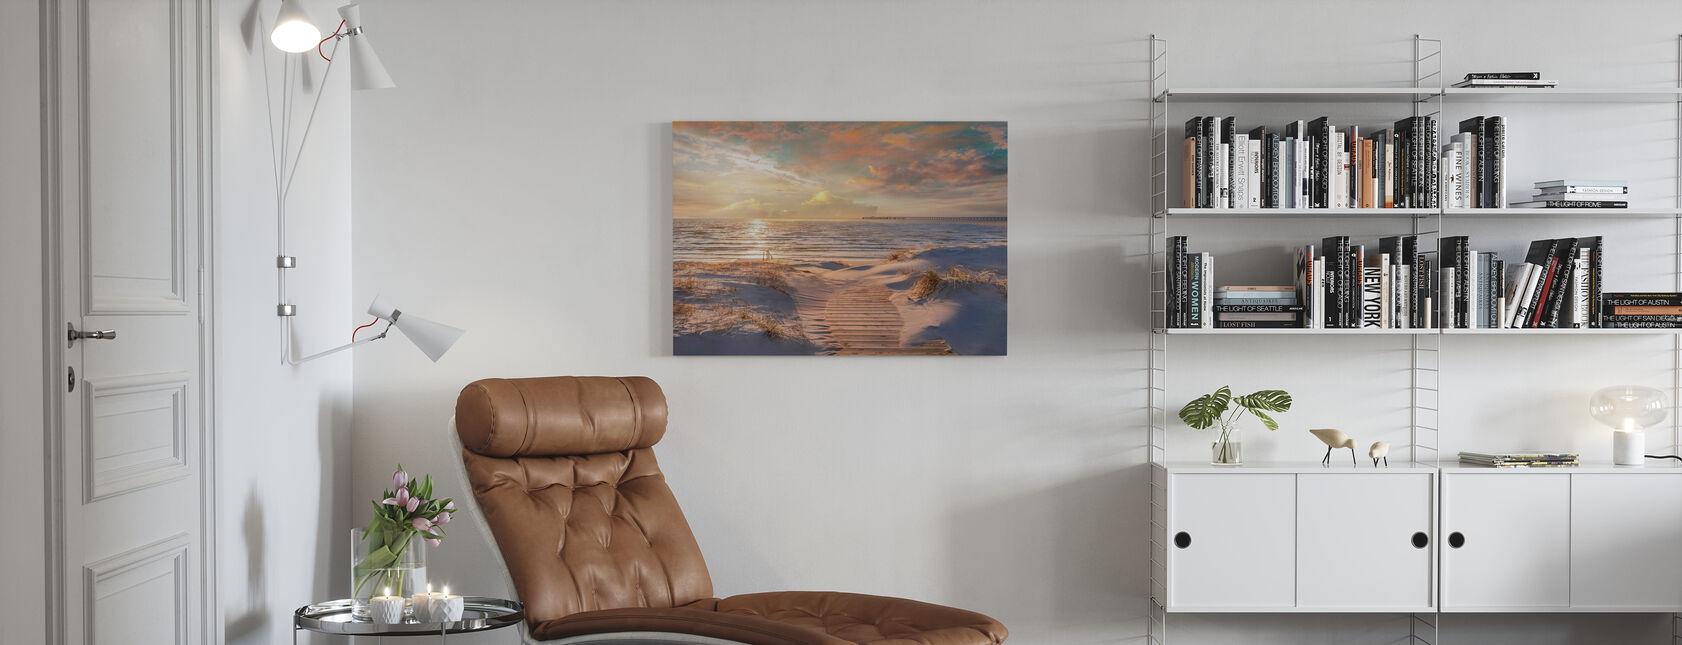 Beach Sand Path - Canvas print - Living Room